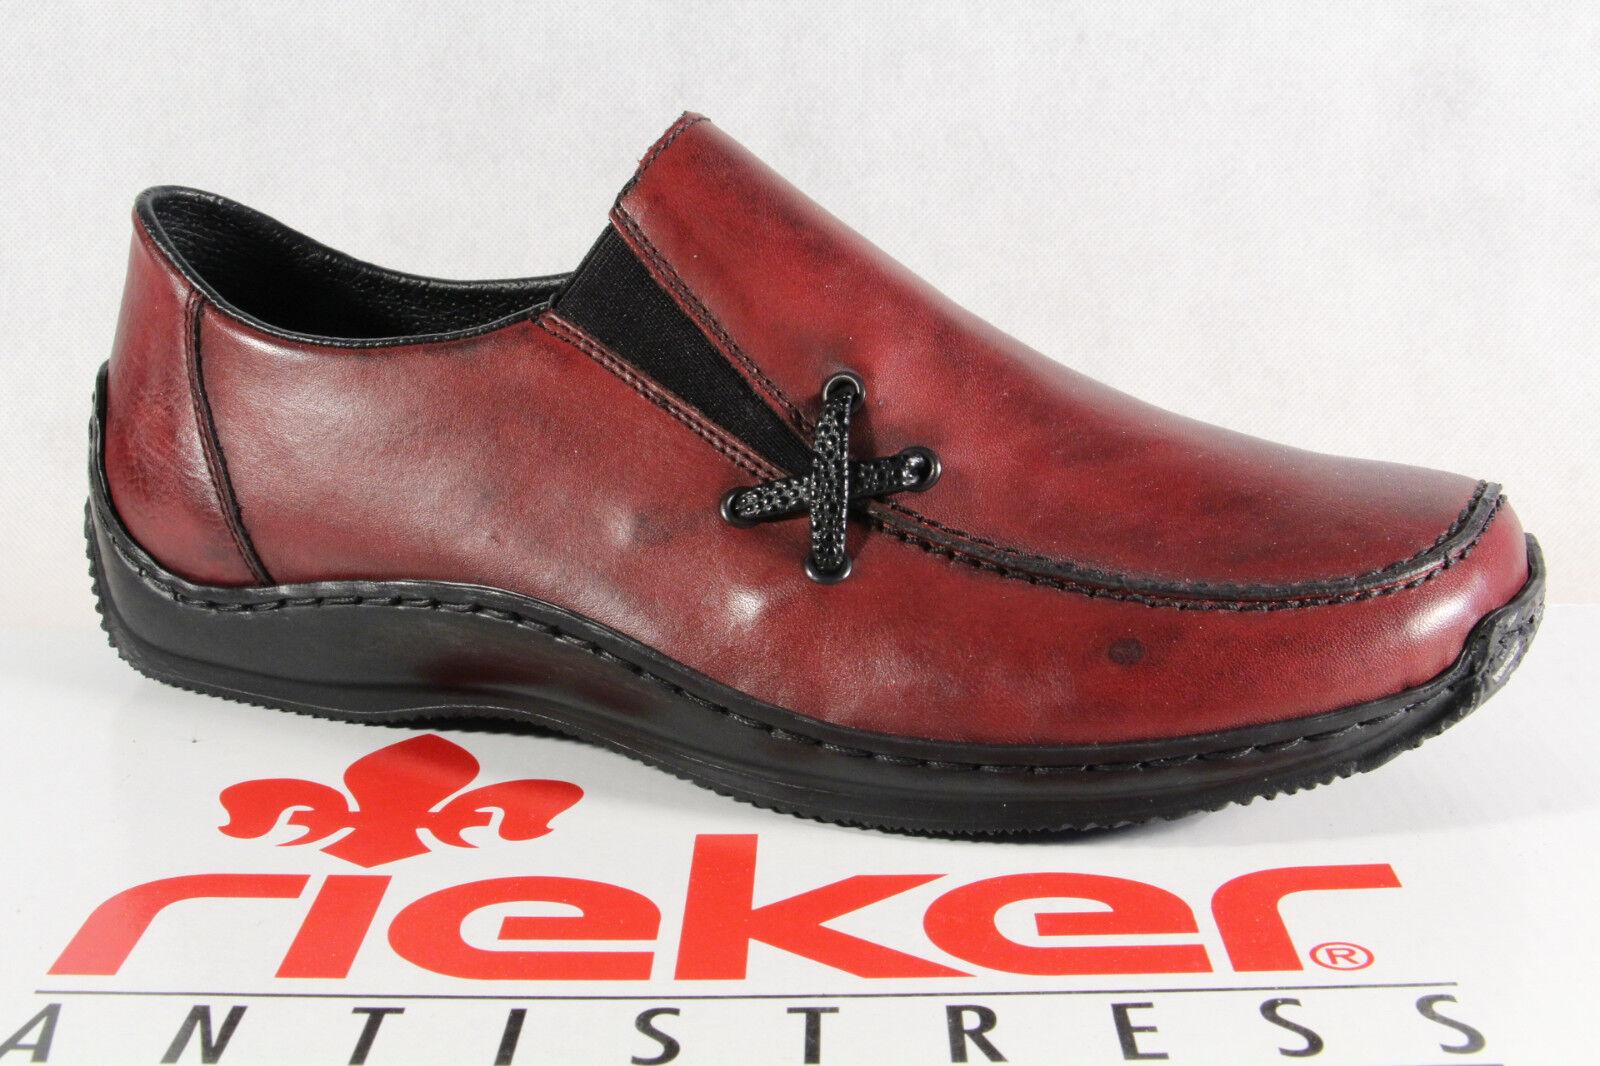 Rieker Donna Slipper Scarpe basse, sneakers in pelle vinaccia l1783 NUOVO!